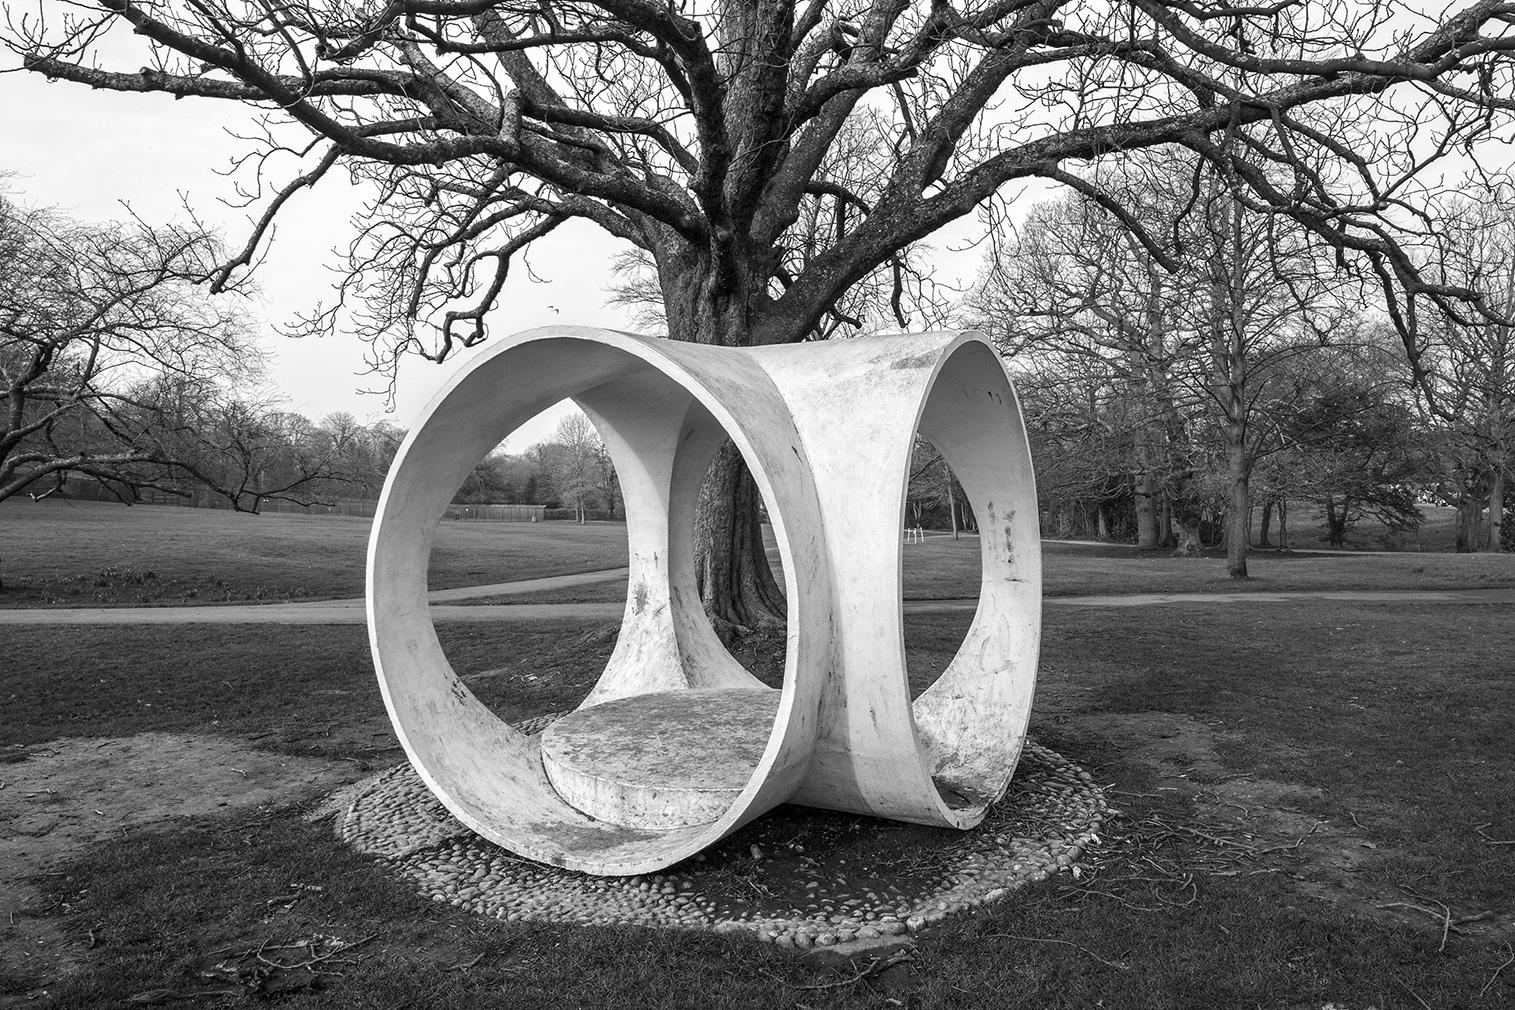 Wendy Taylor, 'Gazebo', Golders Hill Park, Golders Green, London, 1983